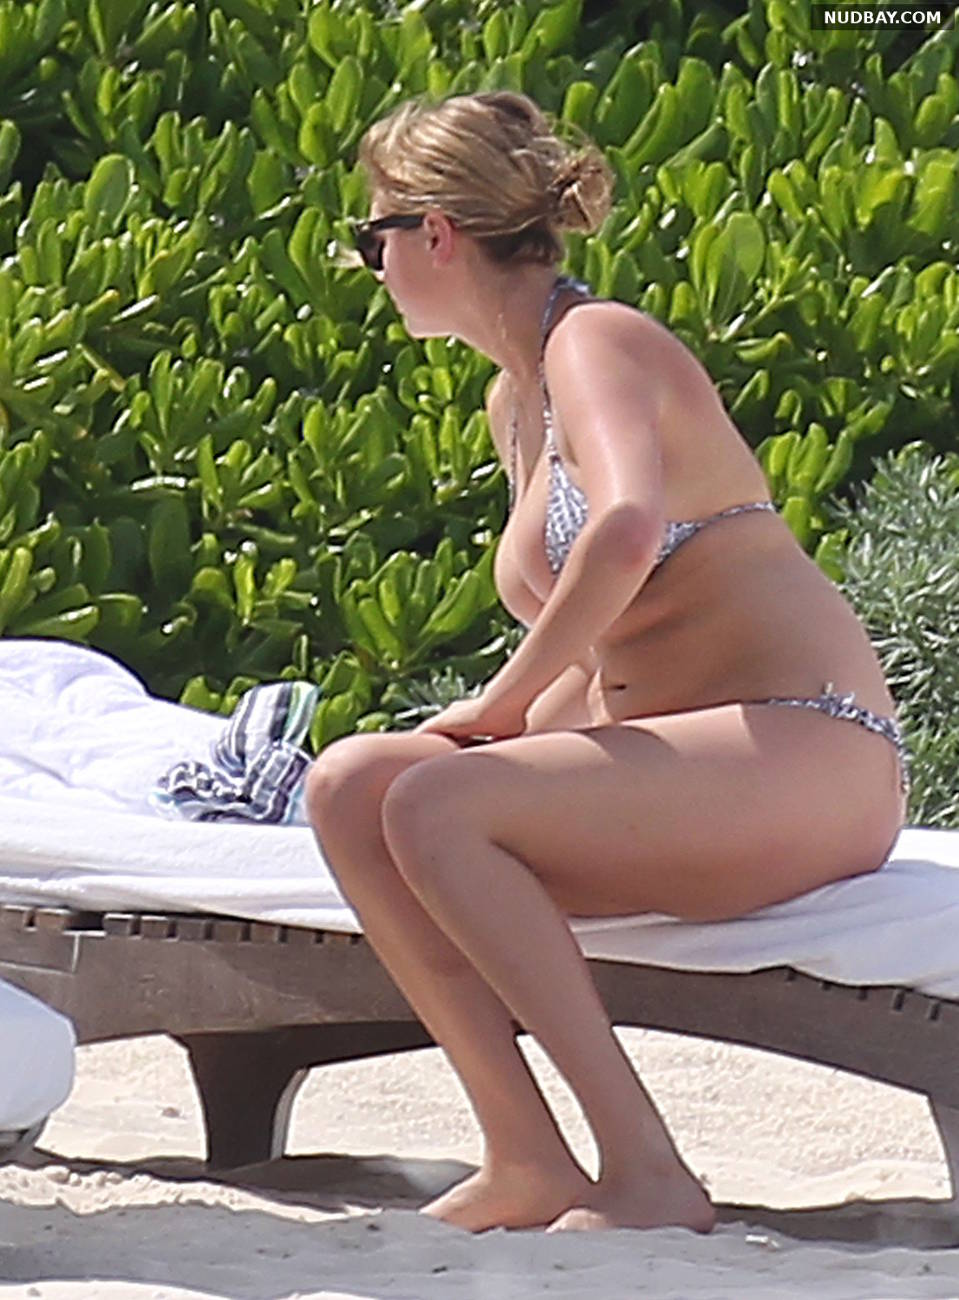 Kate Upton wearing a bikini at a beach in Mexico Jul 15 2014